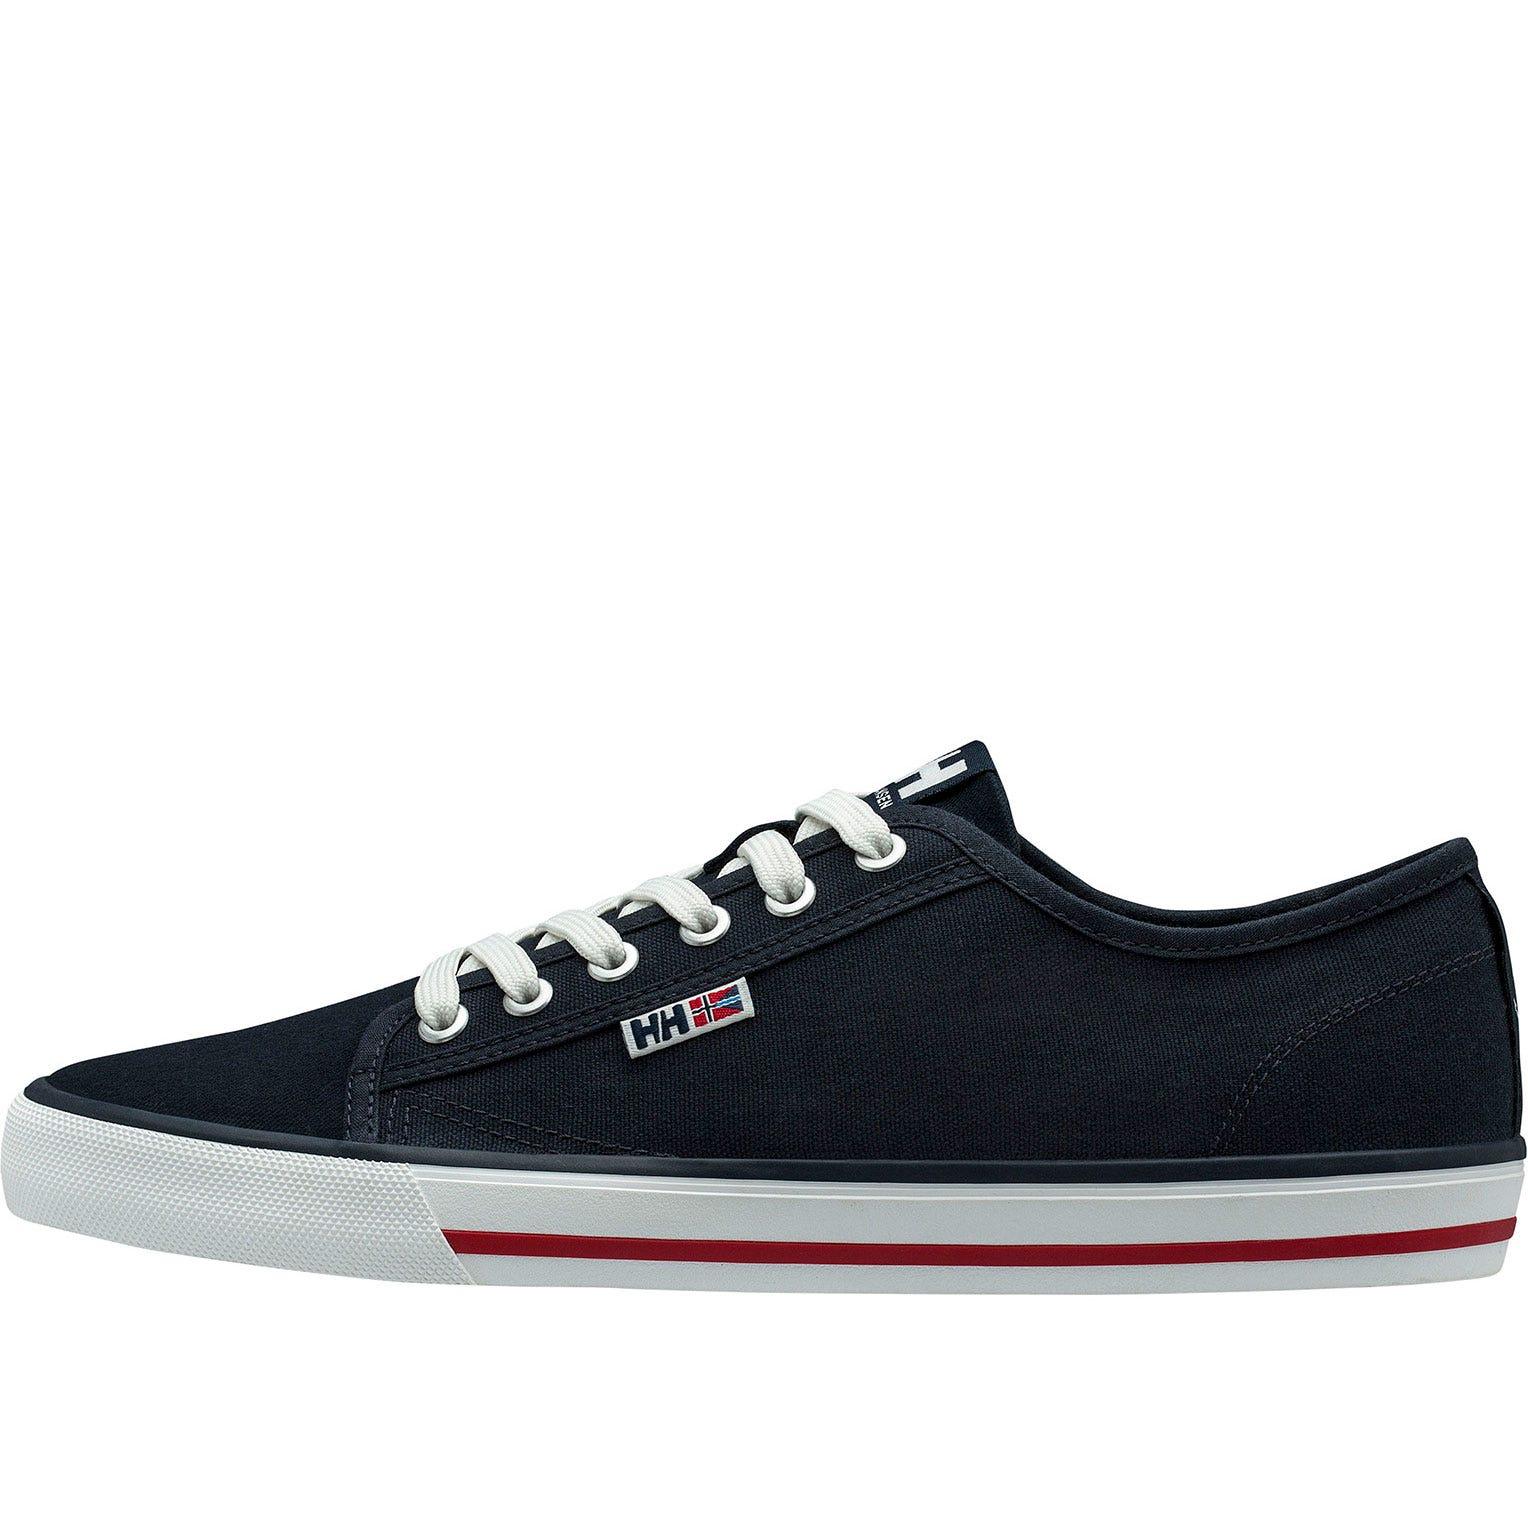 Helly Hansen Mens Casual Shoe Navy 8.5